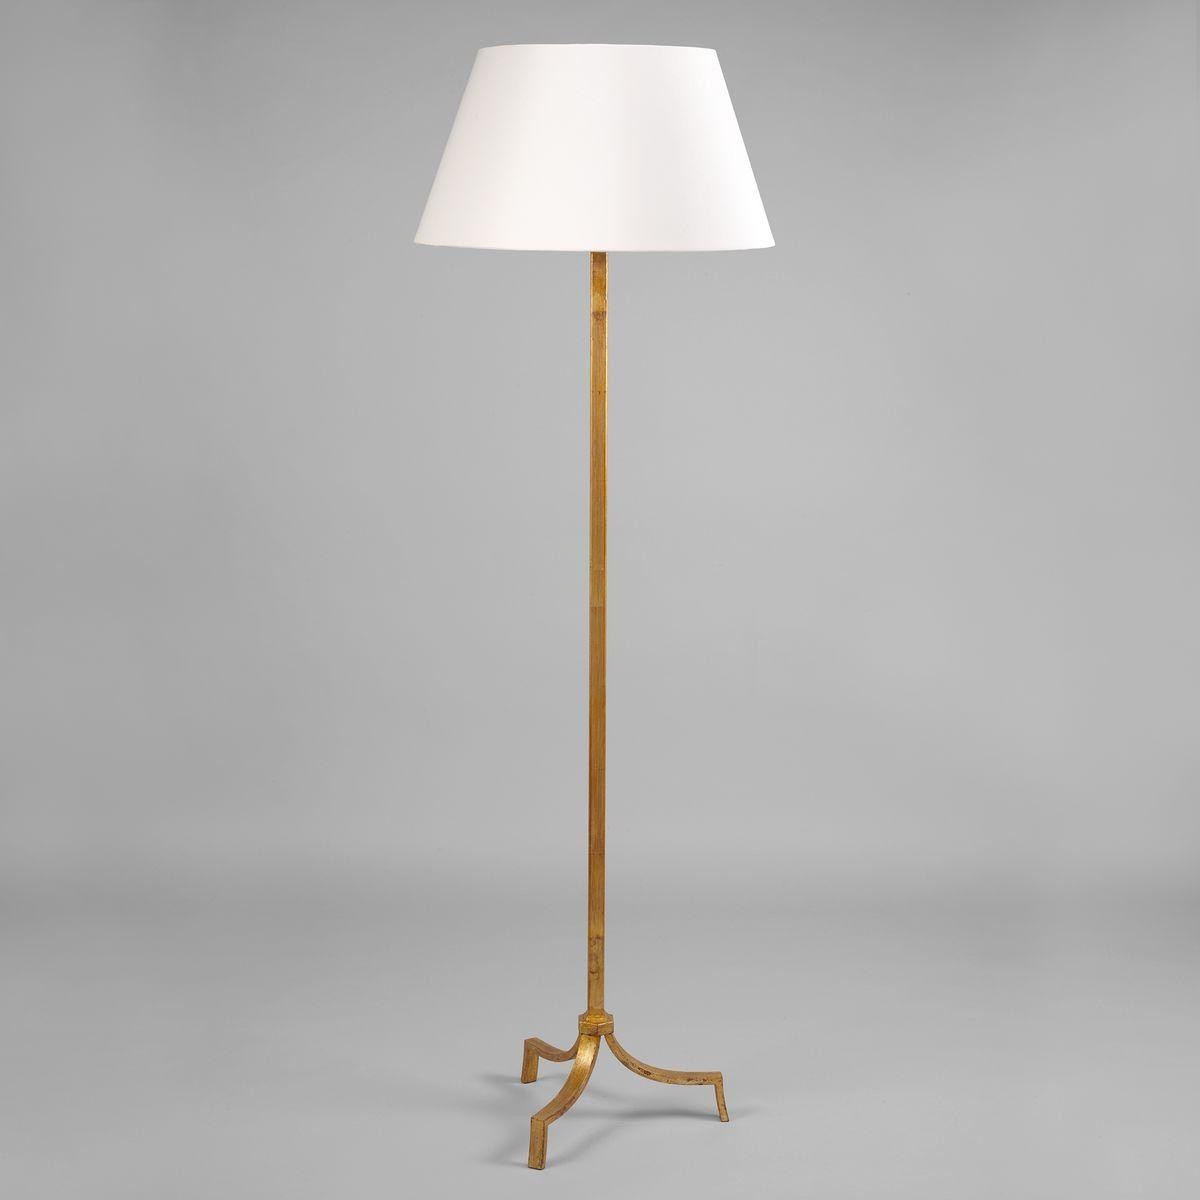 Evry Tripod Lamp Gilt By Vaughan Lamp Tripod Lamp Floor Lamp